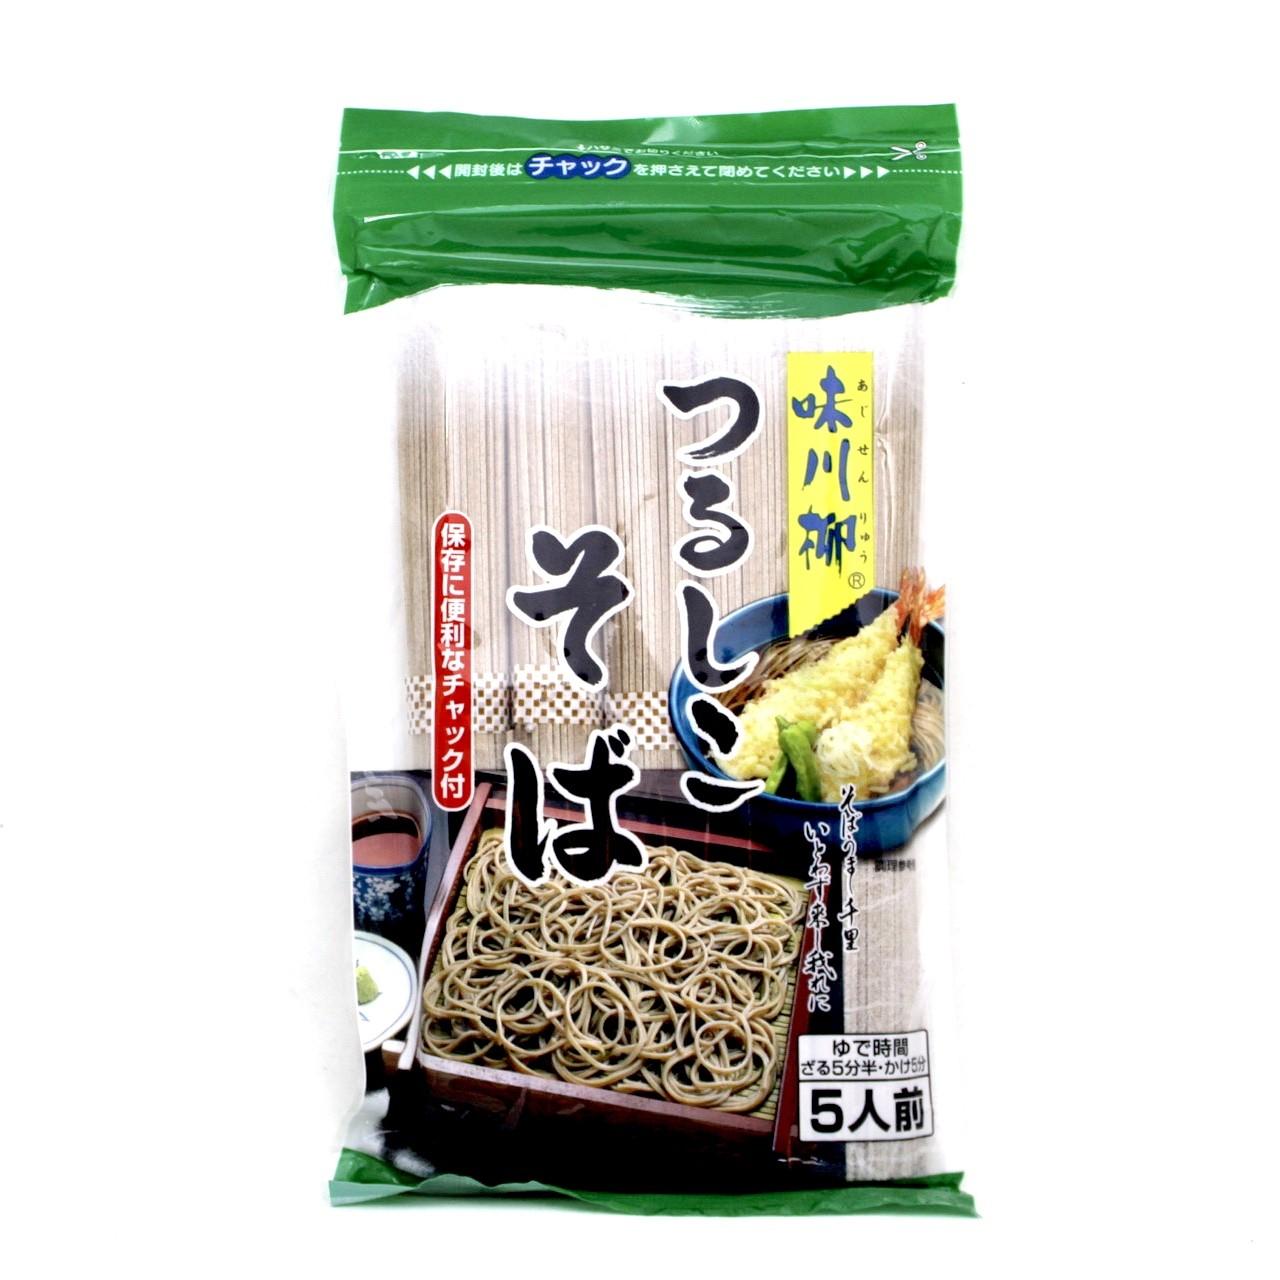 SHIGENO TSURUCHIKO SOBA 400g VENCIMENTO 26/01/2021